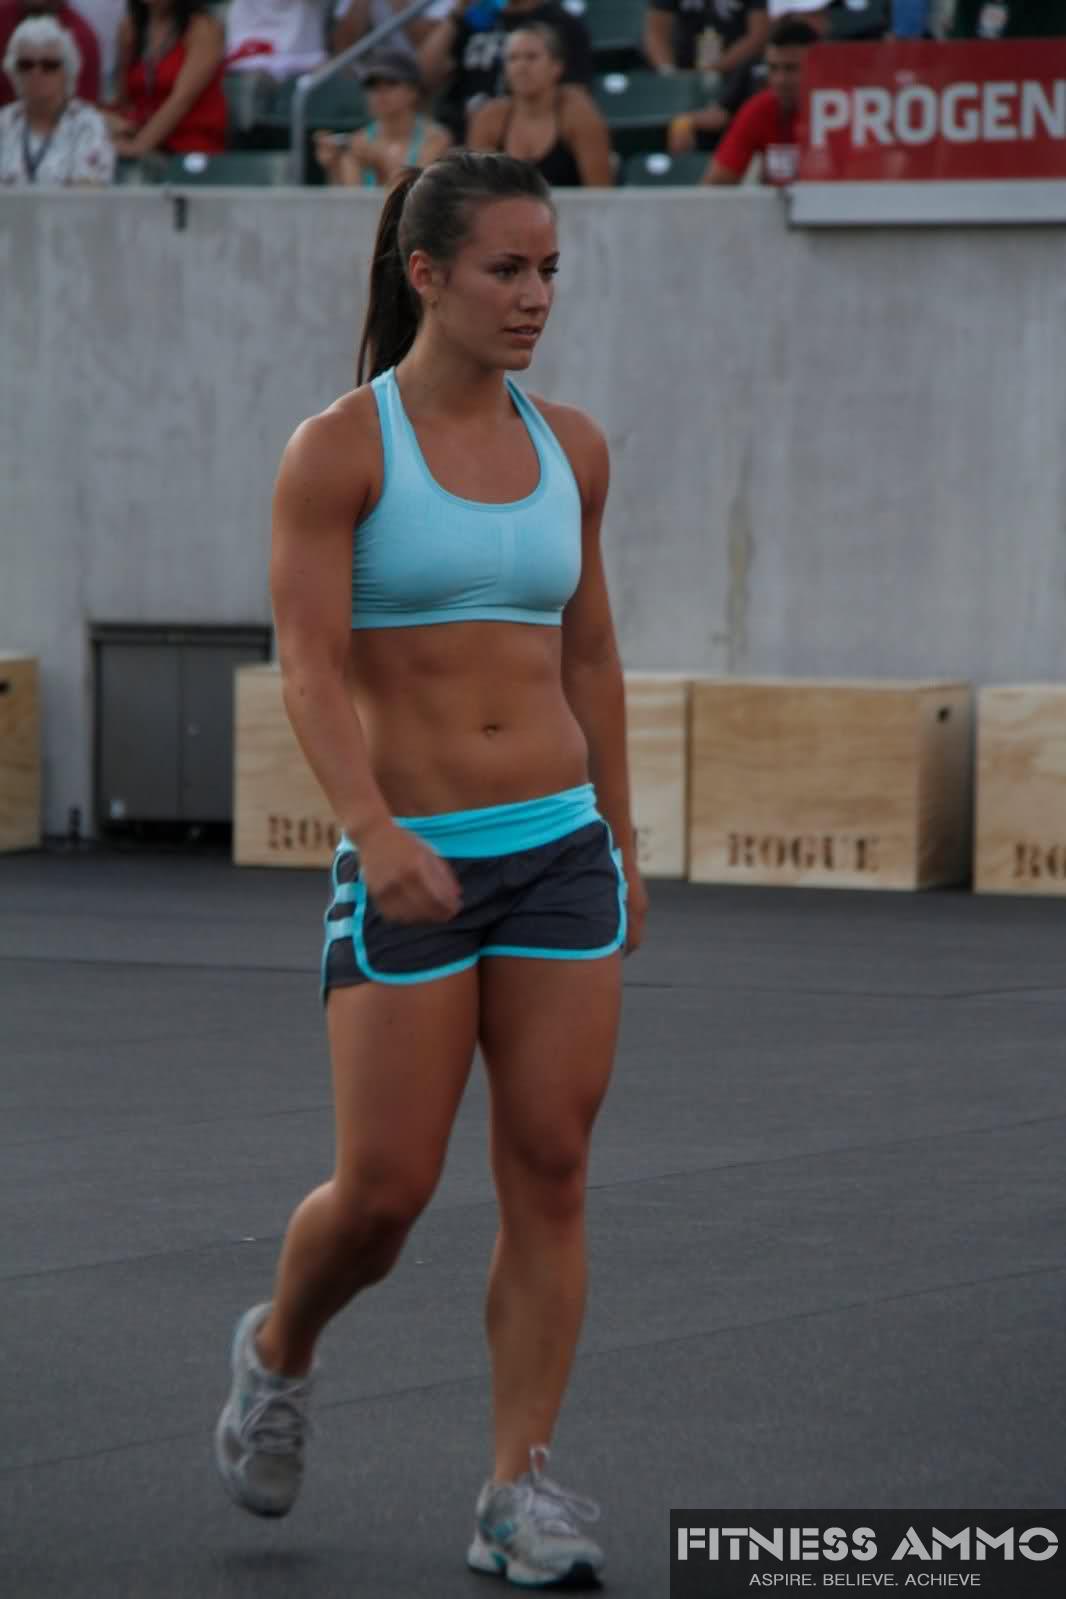 CROSS FIT WOMEN CROSSFIT WOMEN NATURAL BODYBUILDINGCOM FORUMS | Fitness  Ammo | Fitness motivation body, Fitness body, Crossfit body